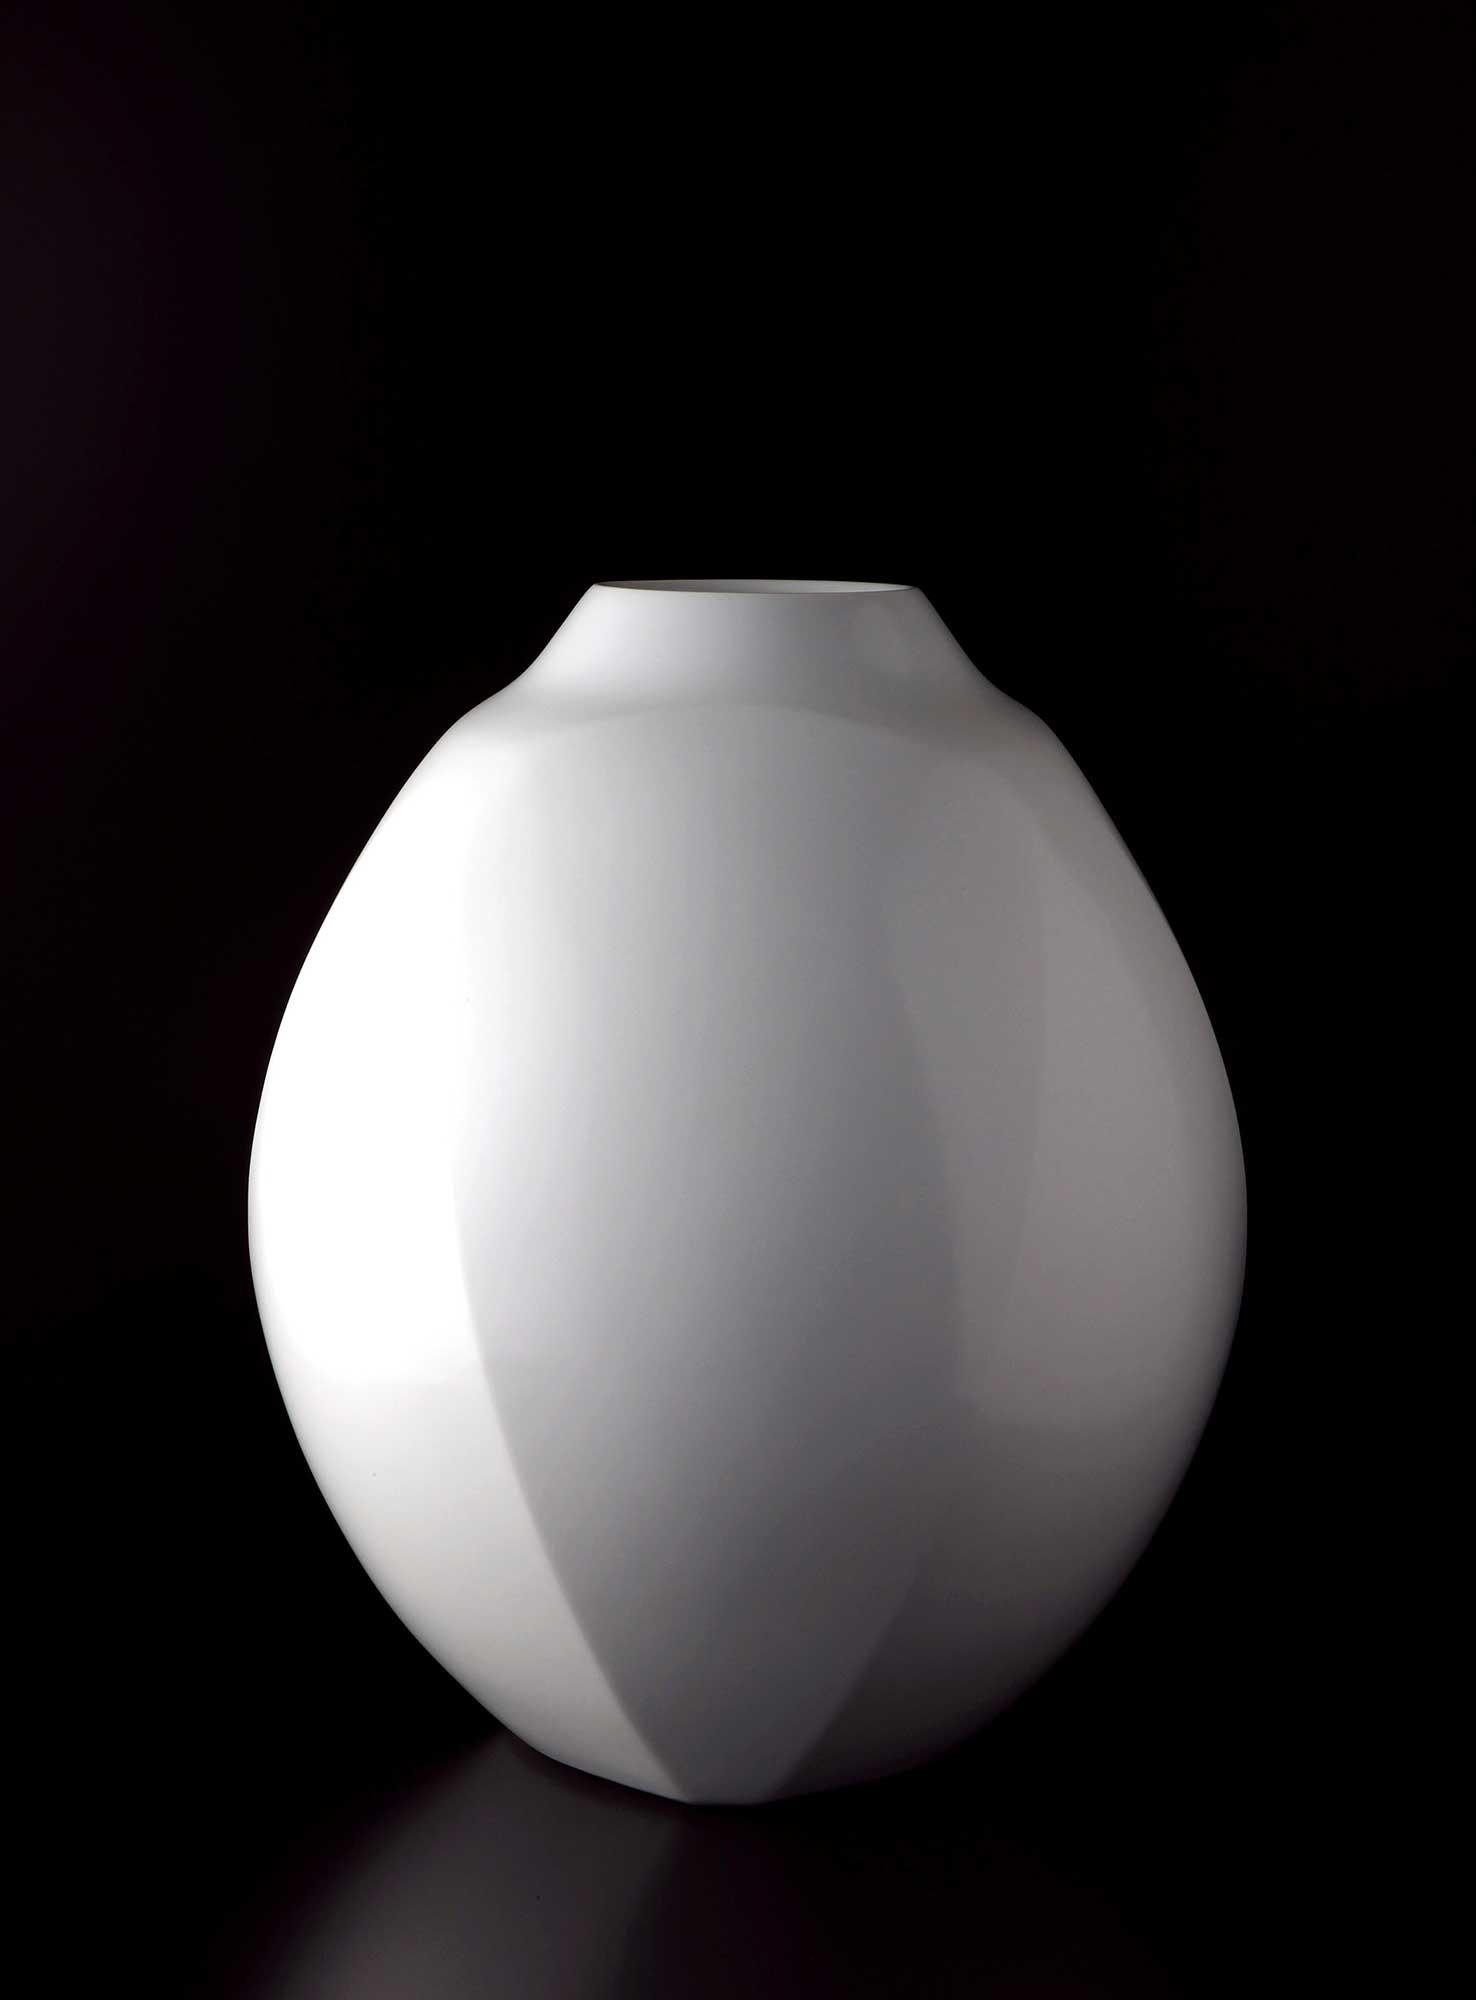 White Porcelain Faceted Vase(2014)